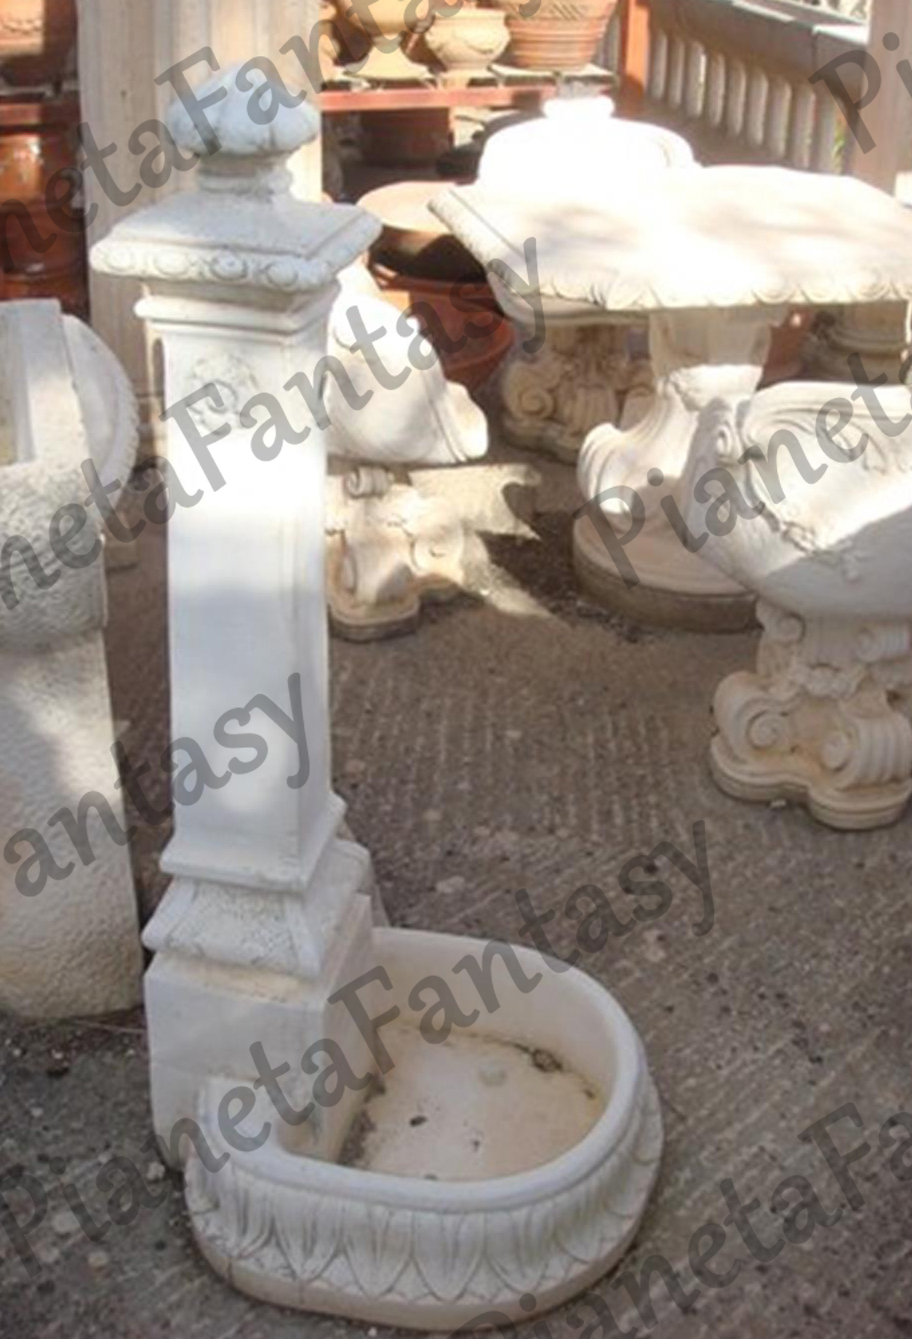 Fontana art 0336 in cemento no pietra arredo giardini e ville for Arredo ville e giardini